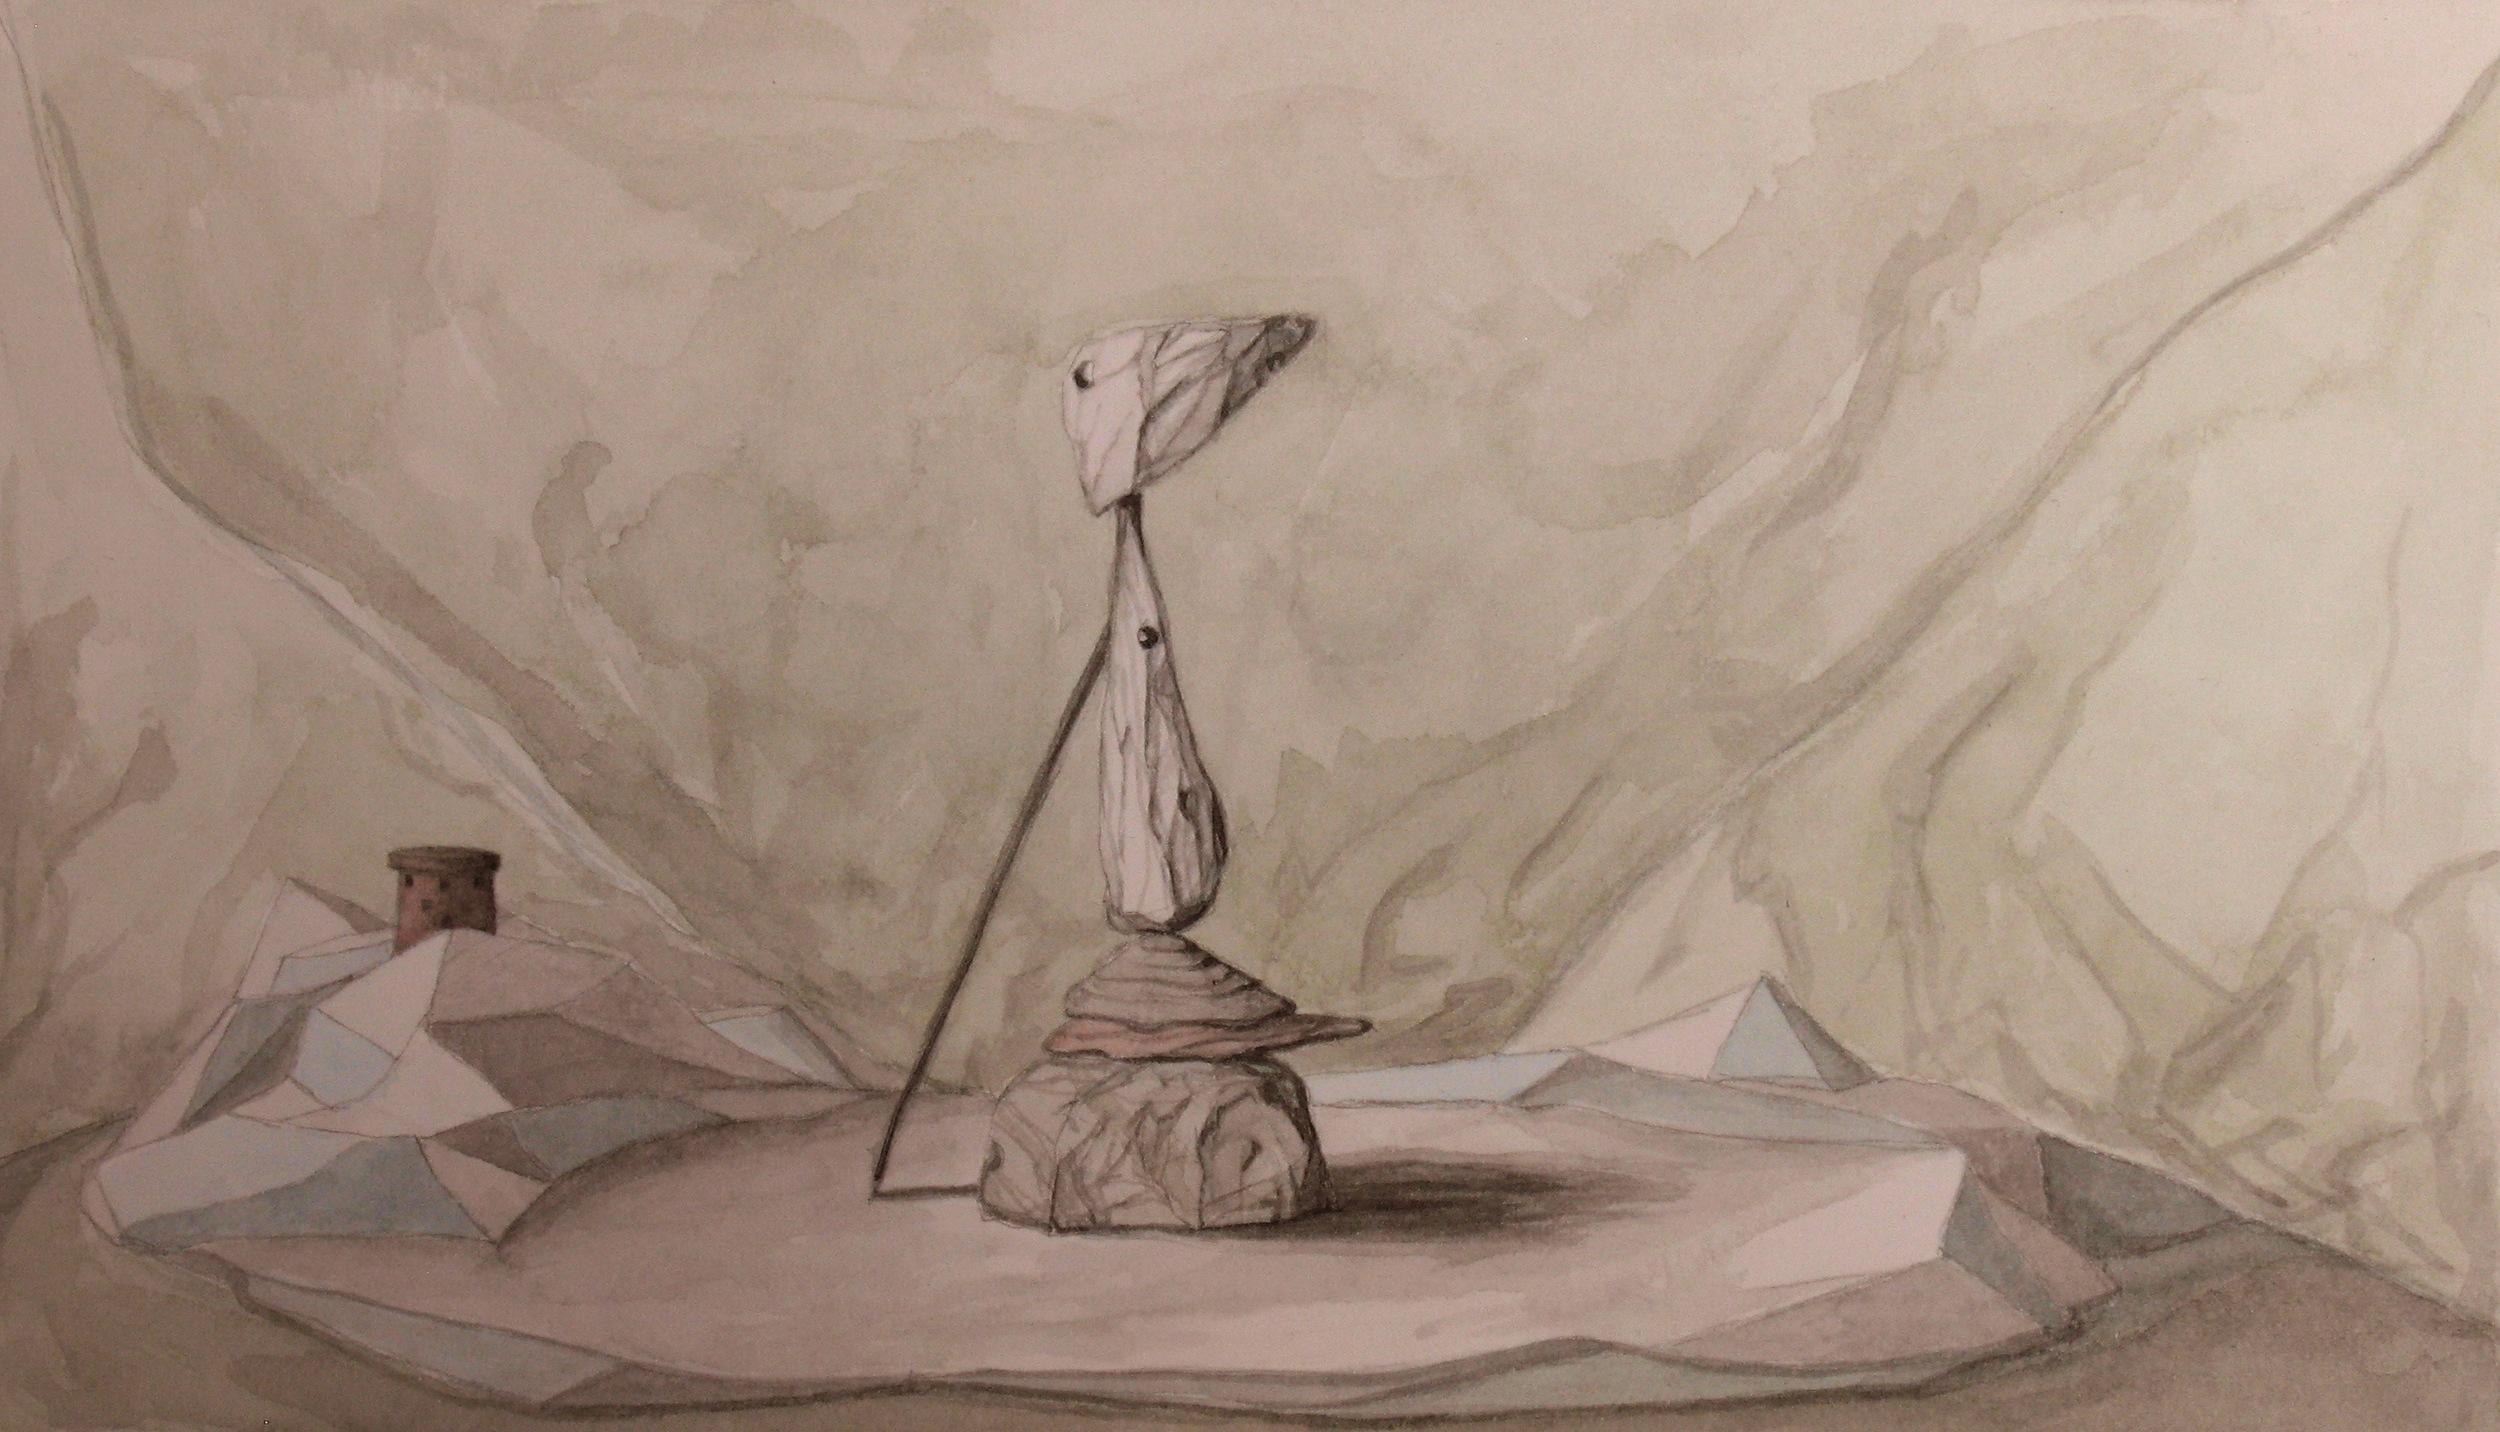 The Pilgrim, Watercolour on paper, 24x14cm, 2010